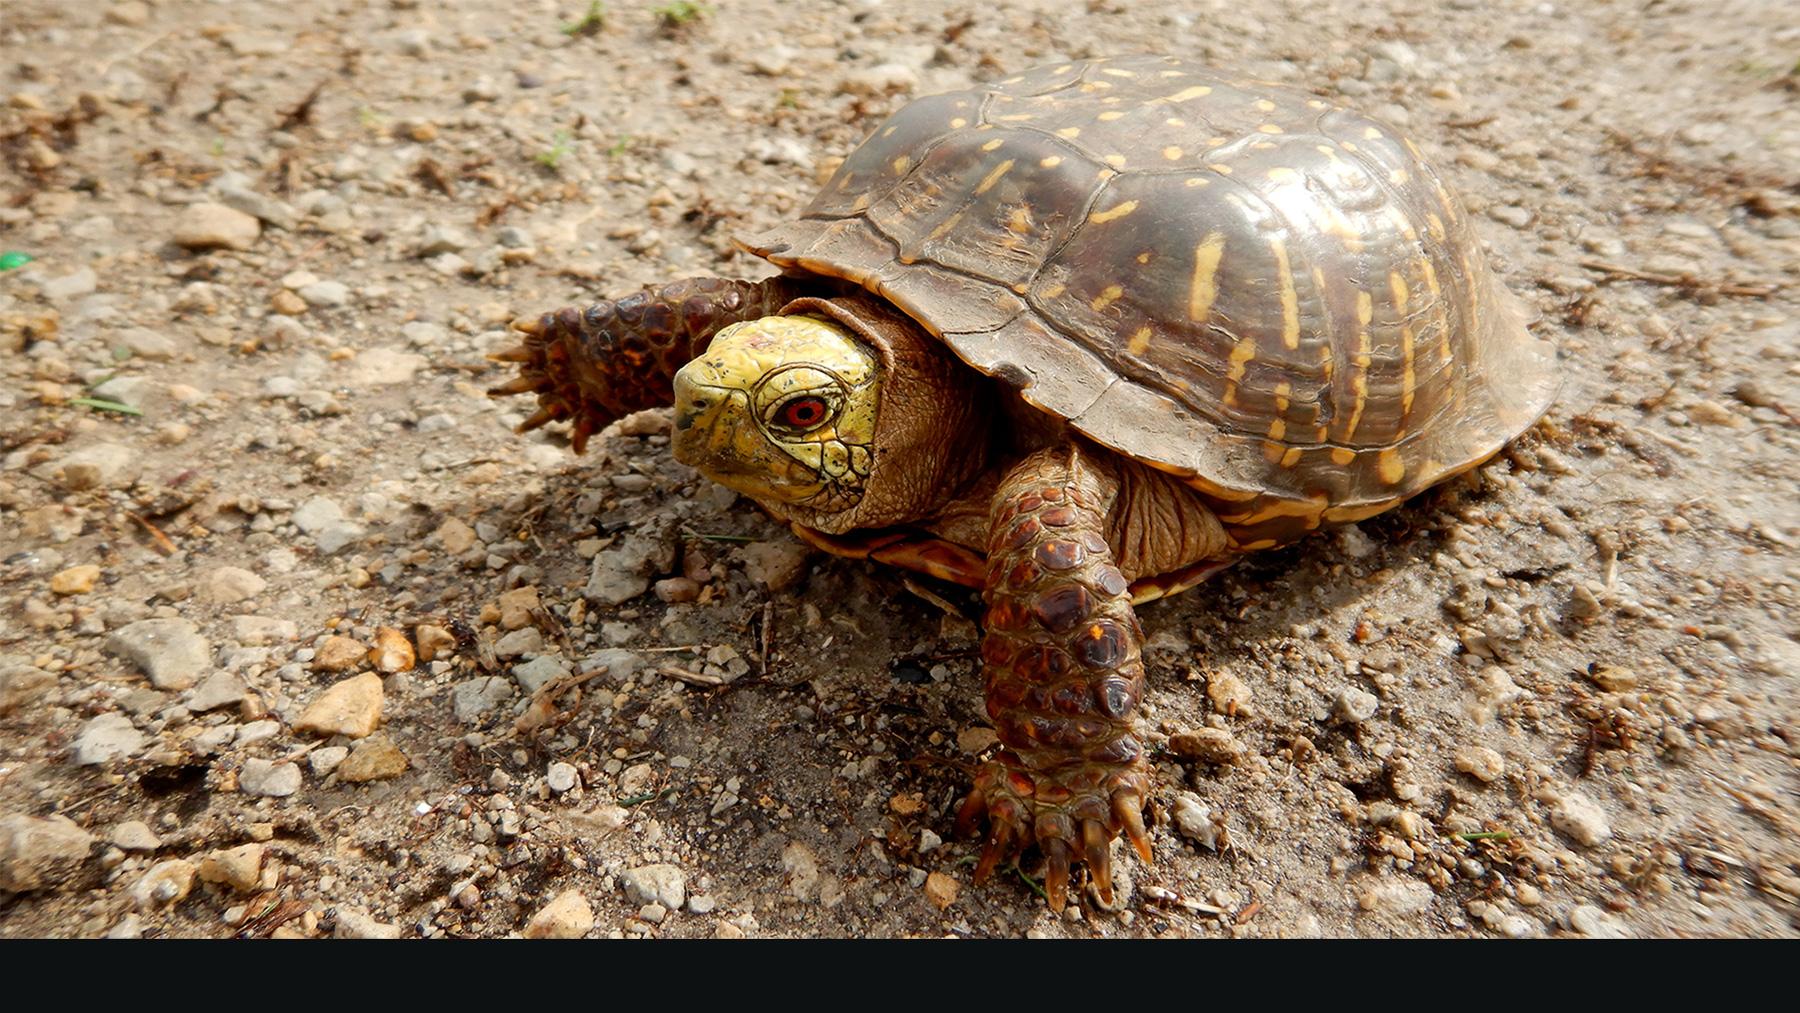 Ornate Turtle. Photo by Devin Edmonds